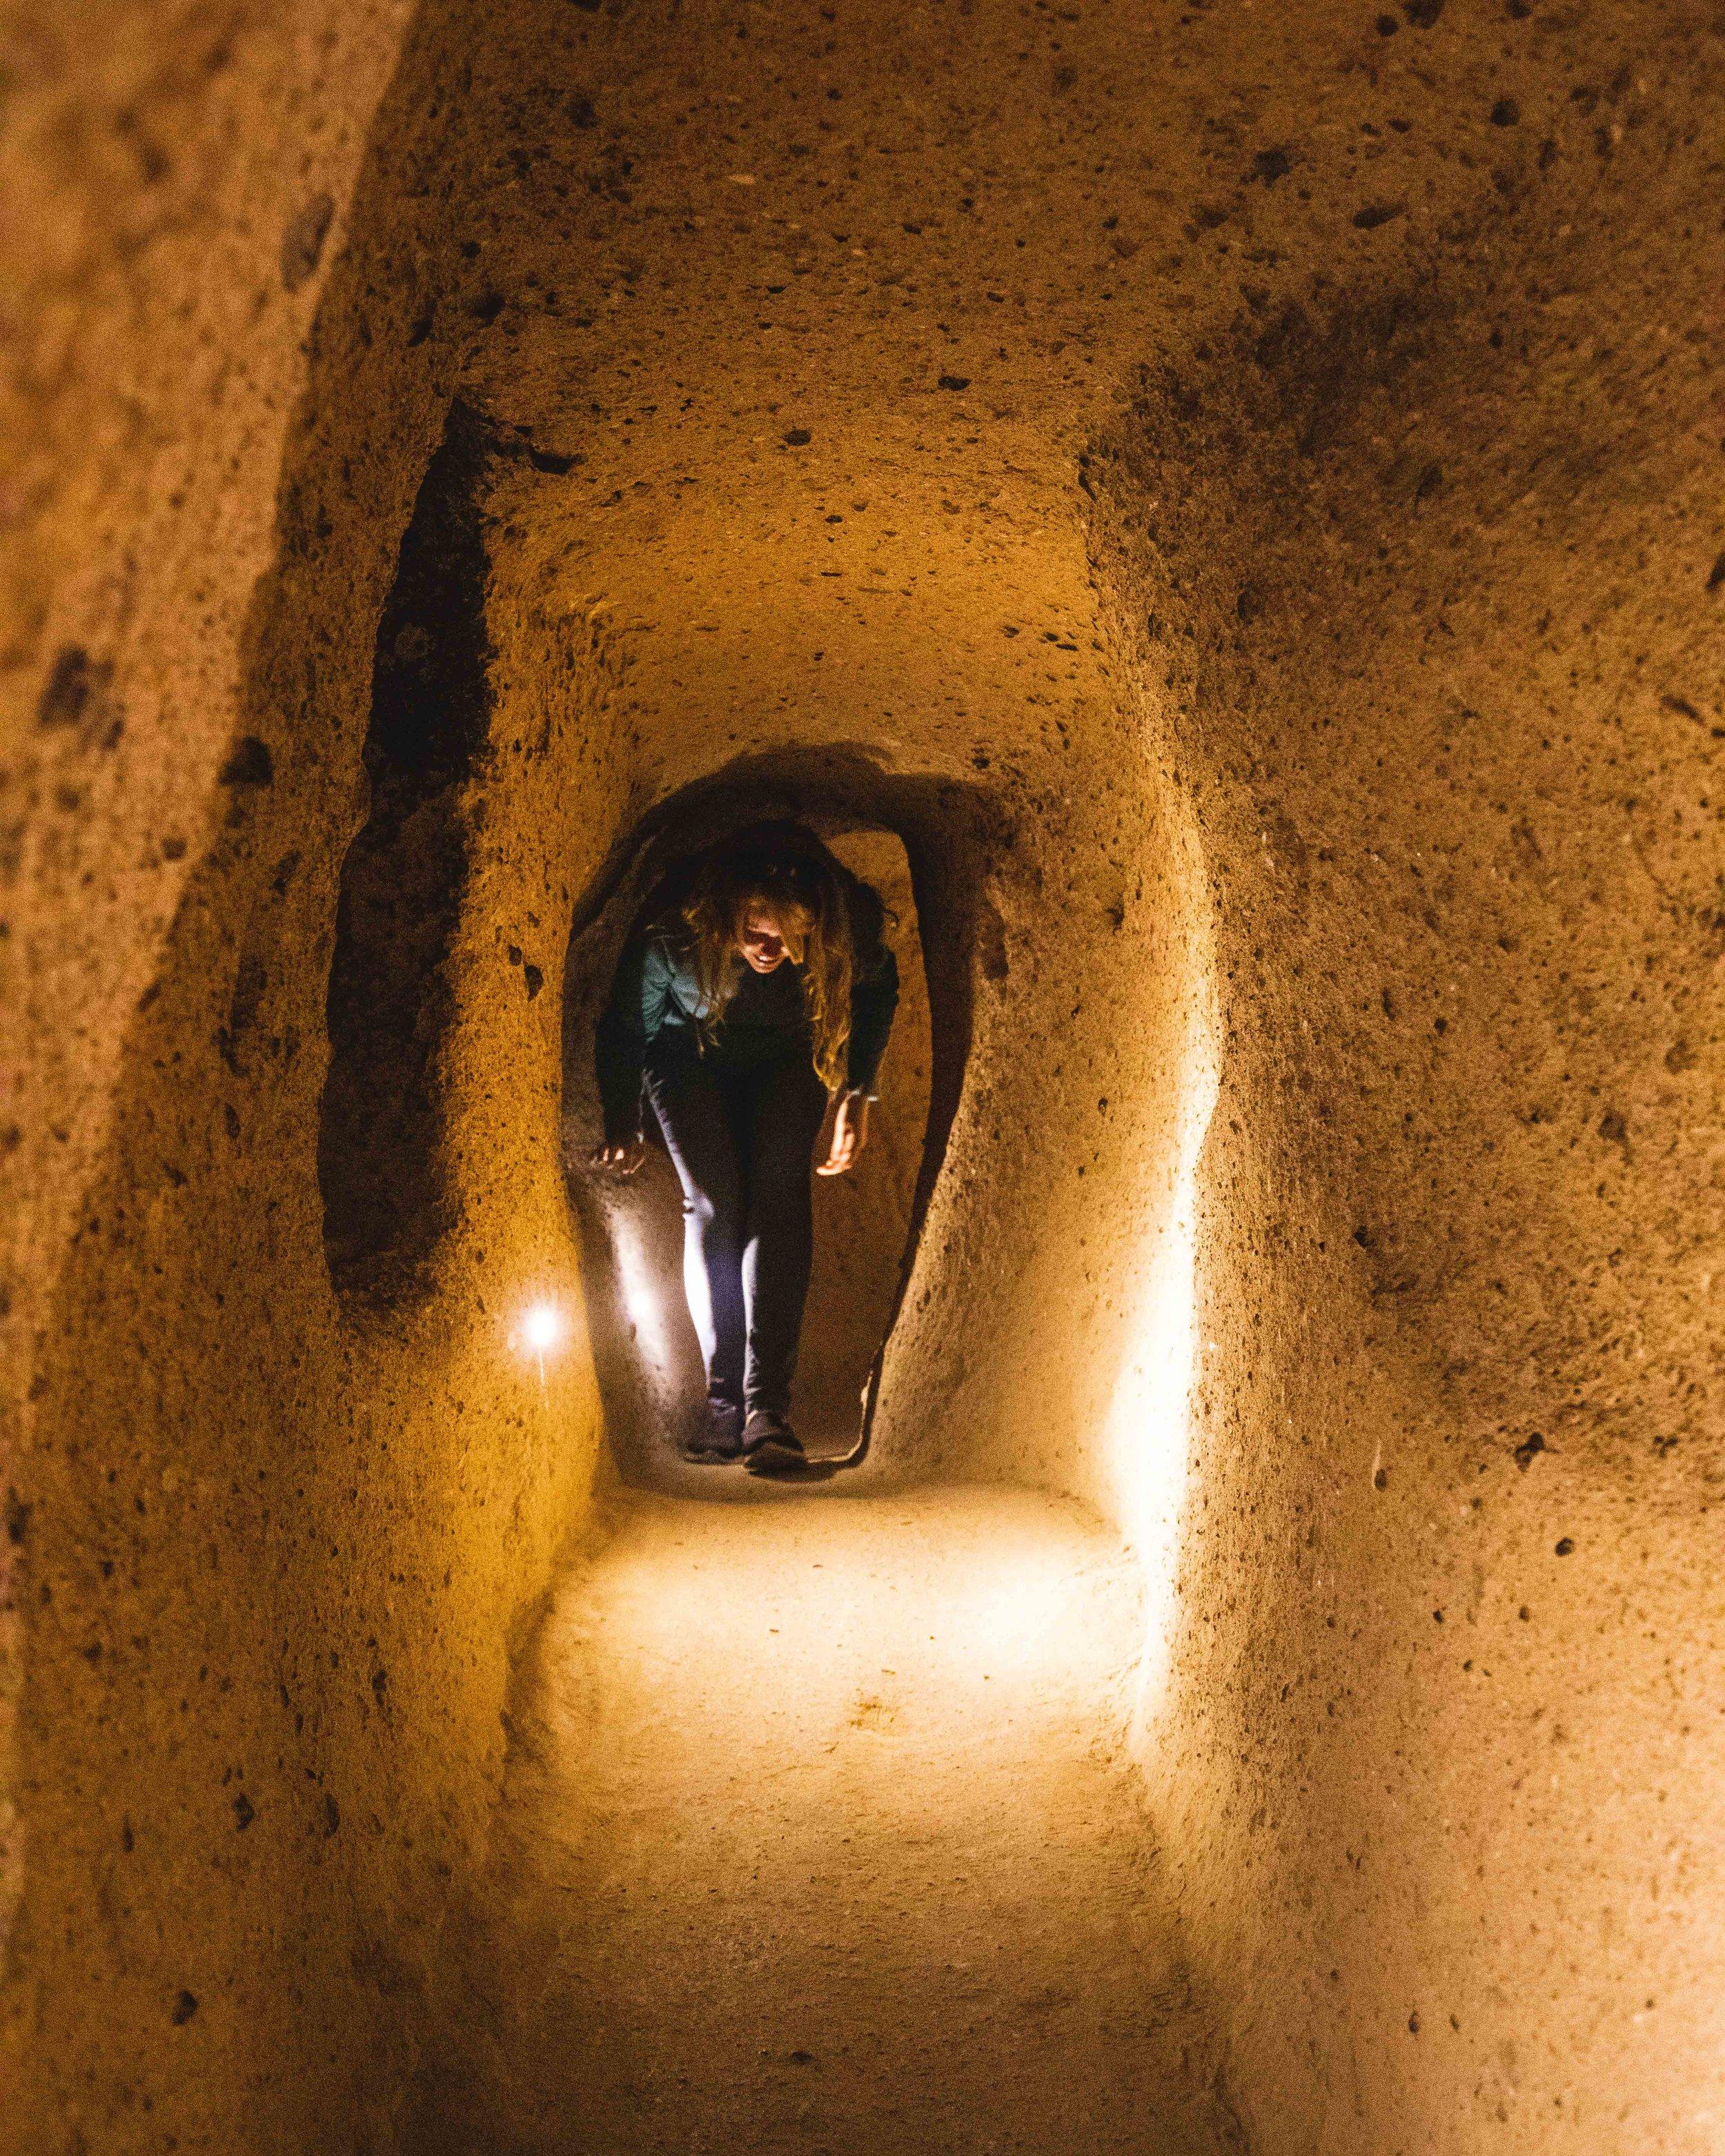 Kaymakli Underground city - Cappadocia